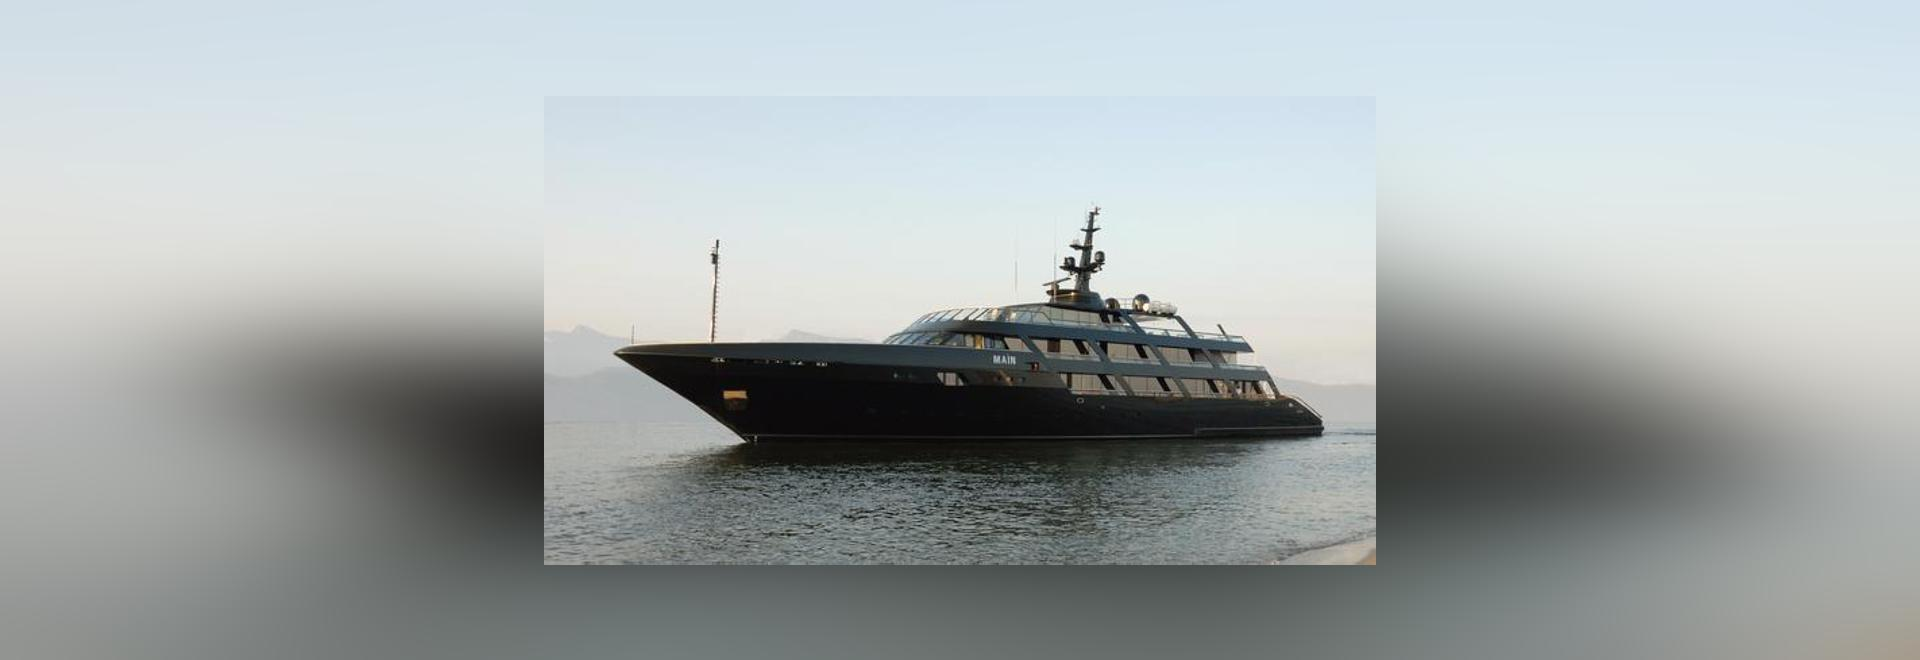 Armanis 65 Meter Codecasa superyacht Maìn